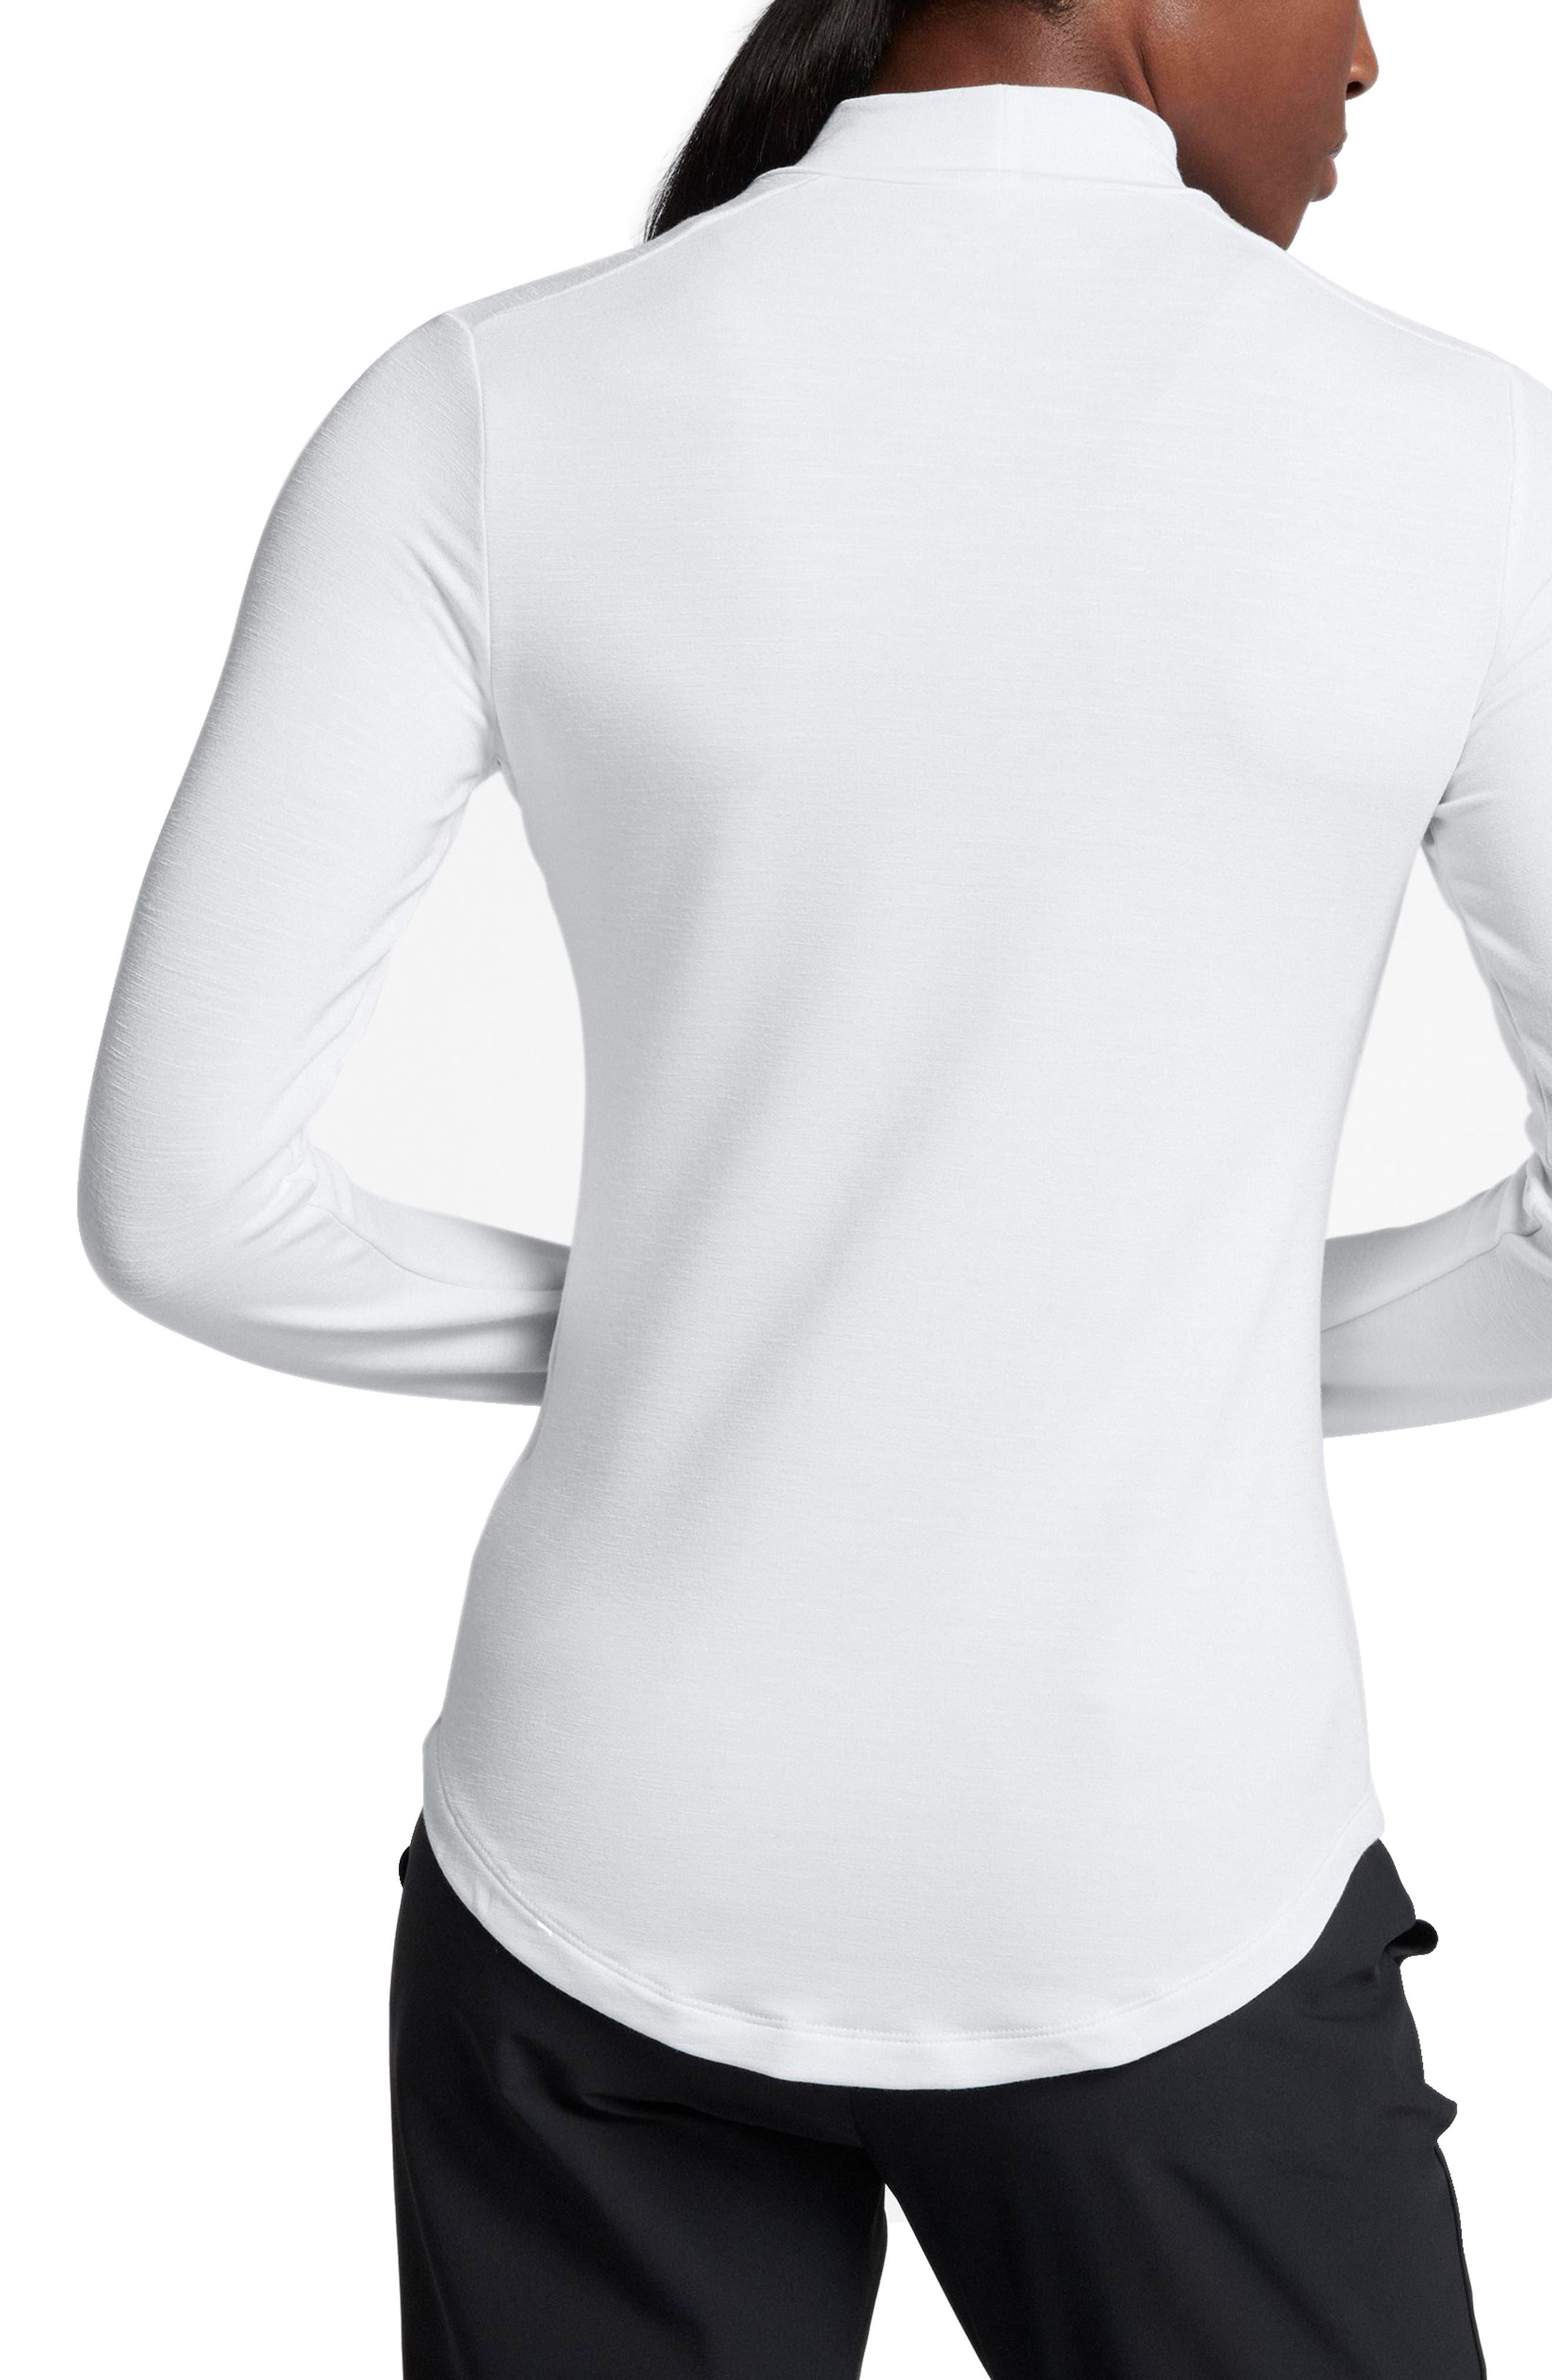 Dry Long Sleeve Golf Top,                             Alternate thumbnail 2, color,                             White